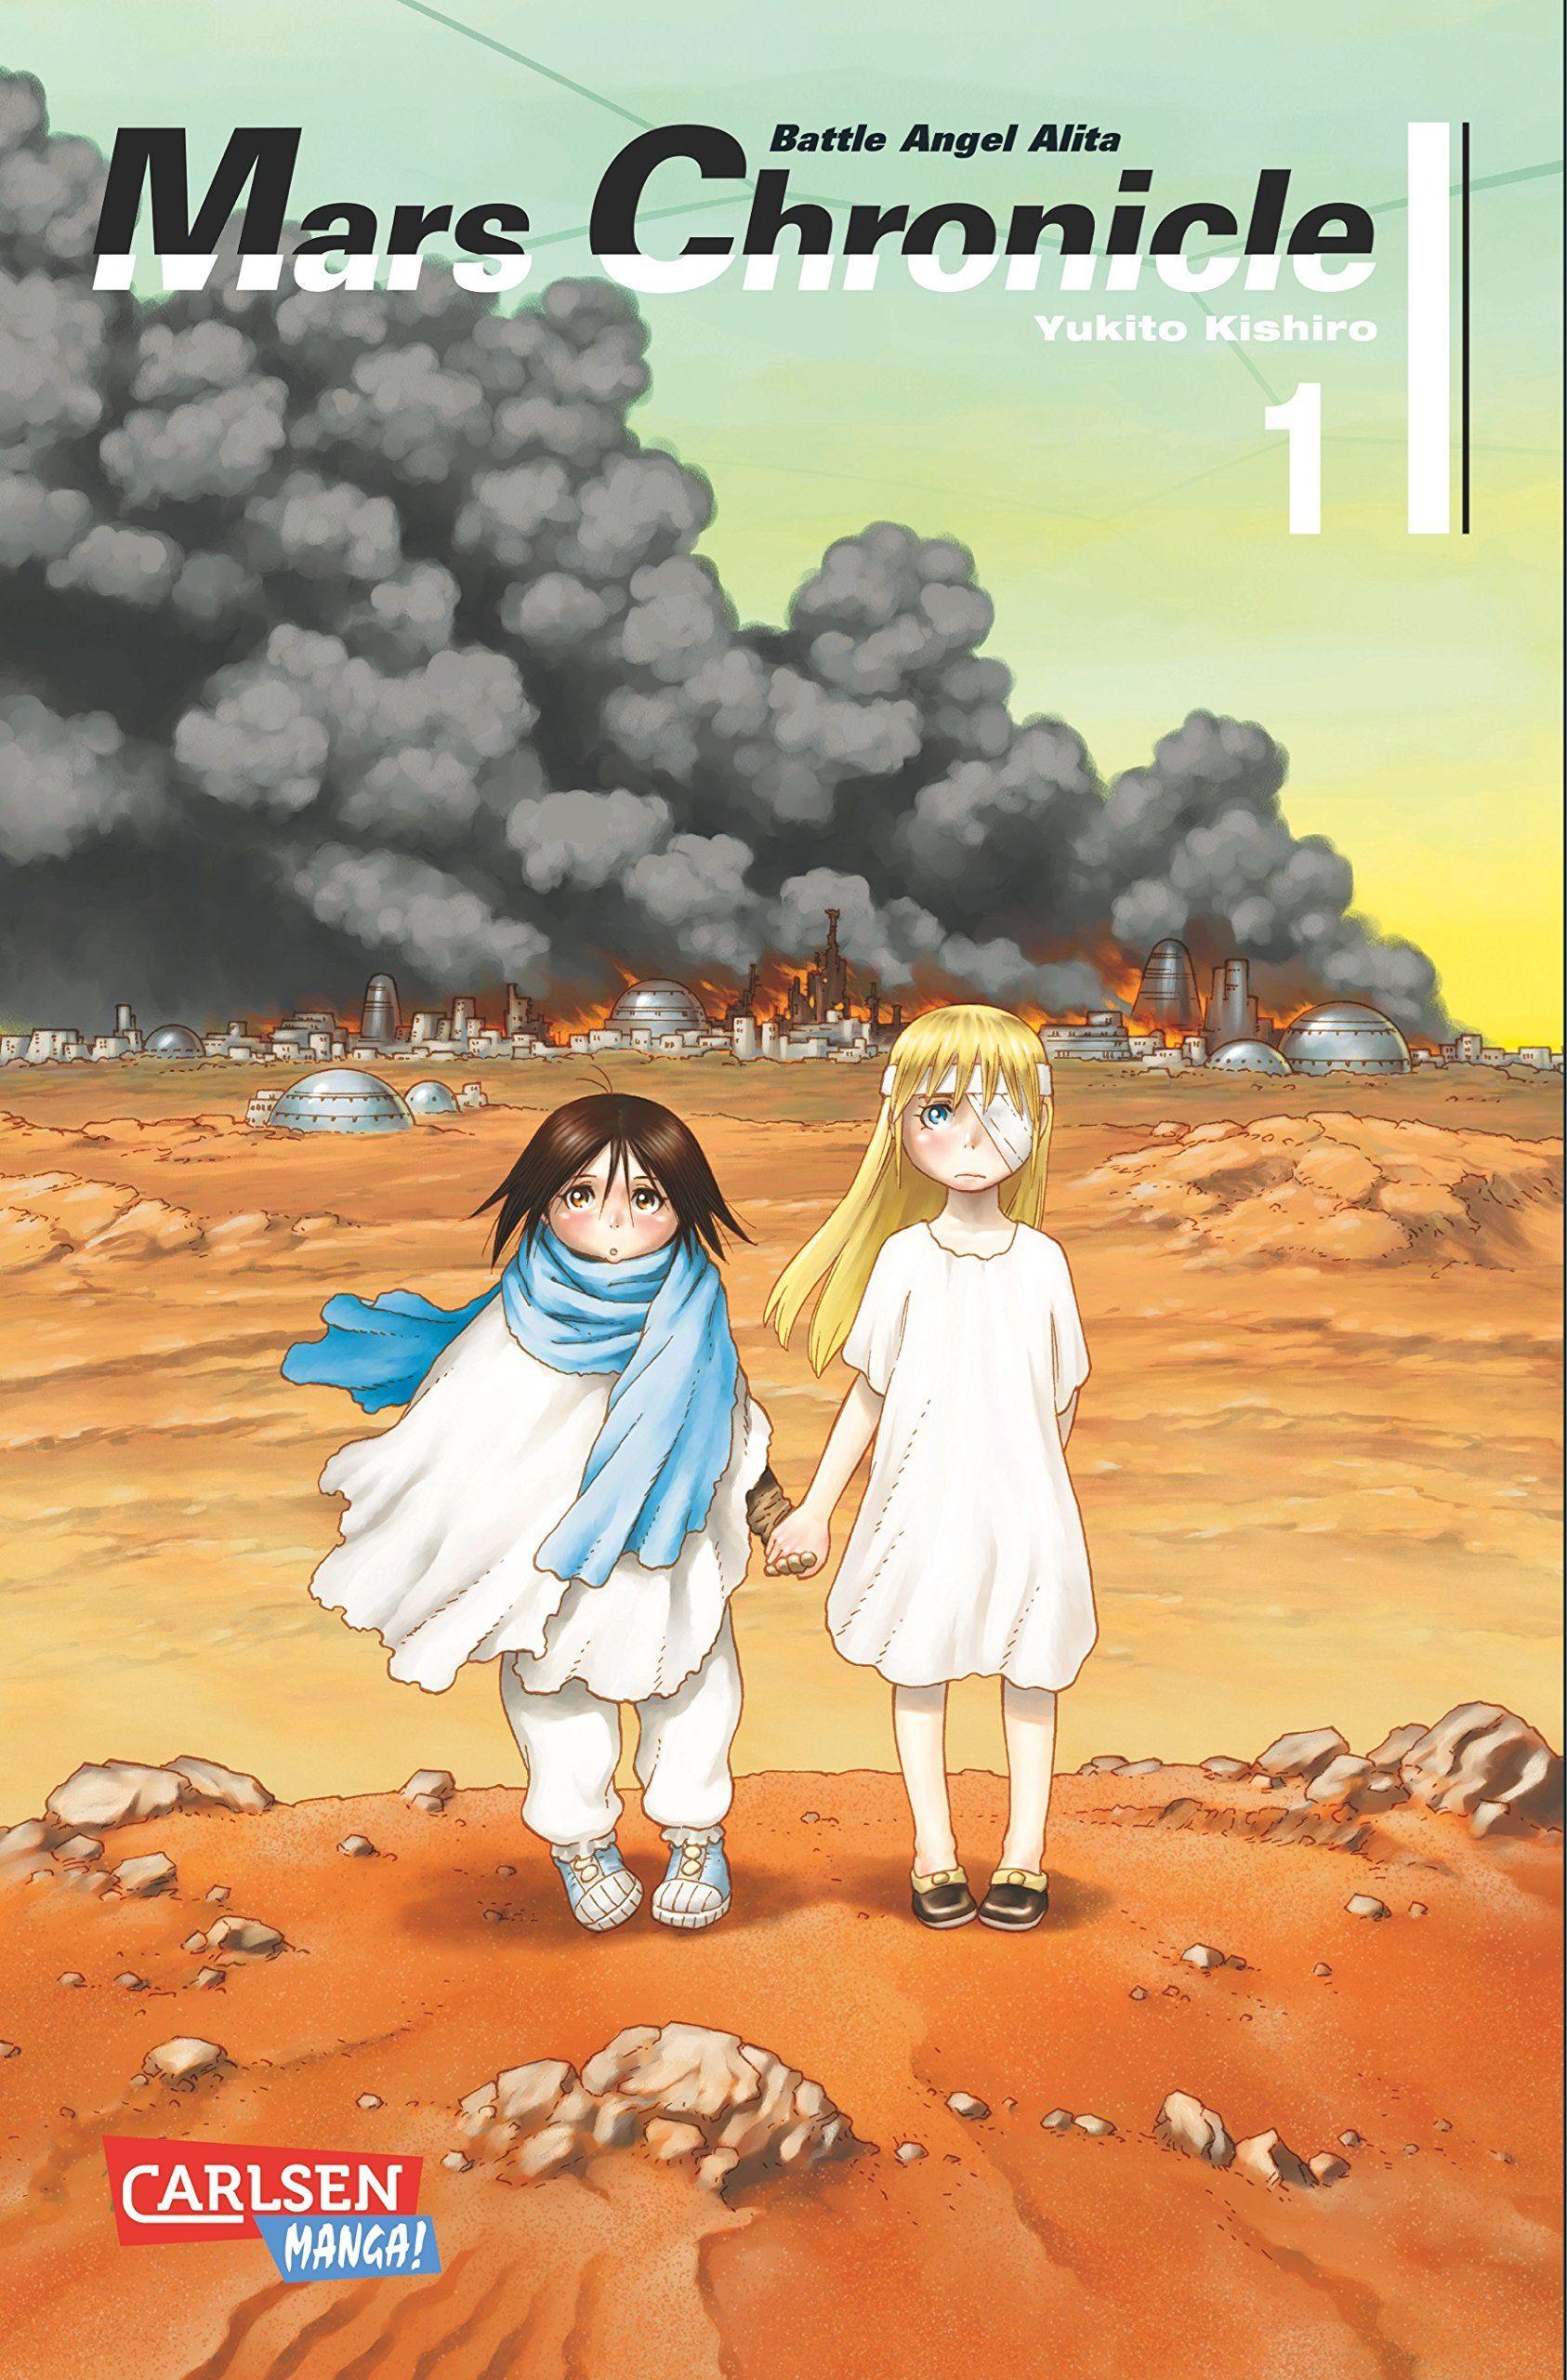 Best manga covers ever?